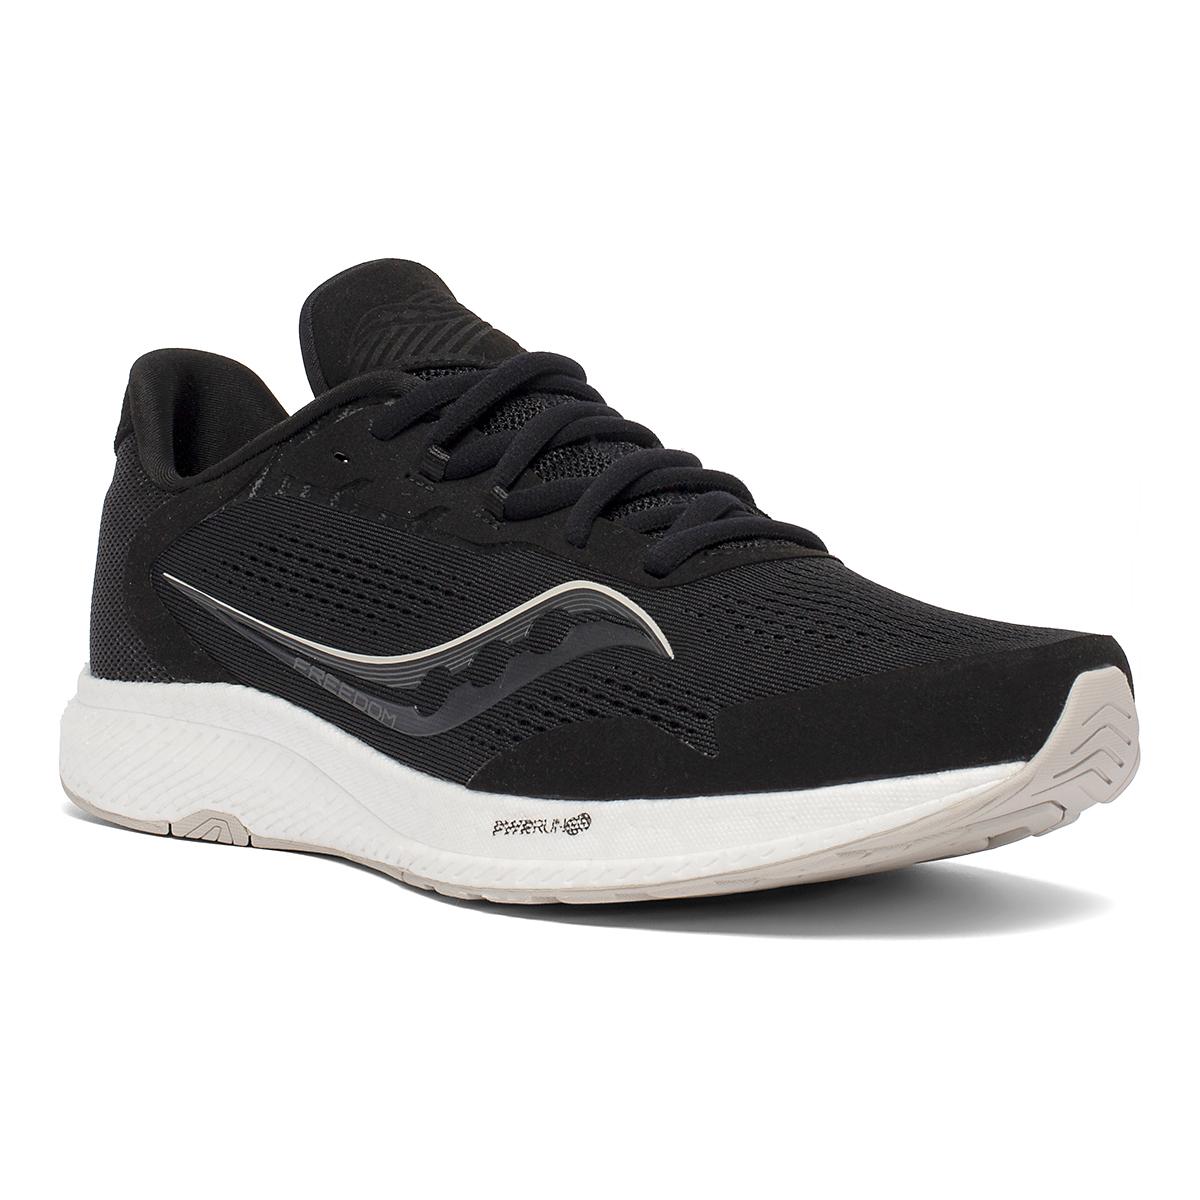 Men's Saucony Freedom 4 Running Shoe - Color: Black/Stone - Size: 7 - Width: Regular, Black/Stone, large, image 3